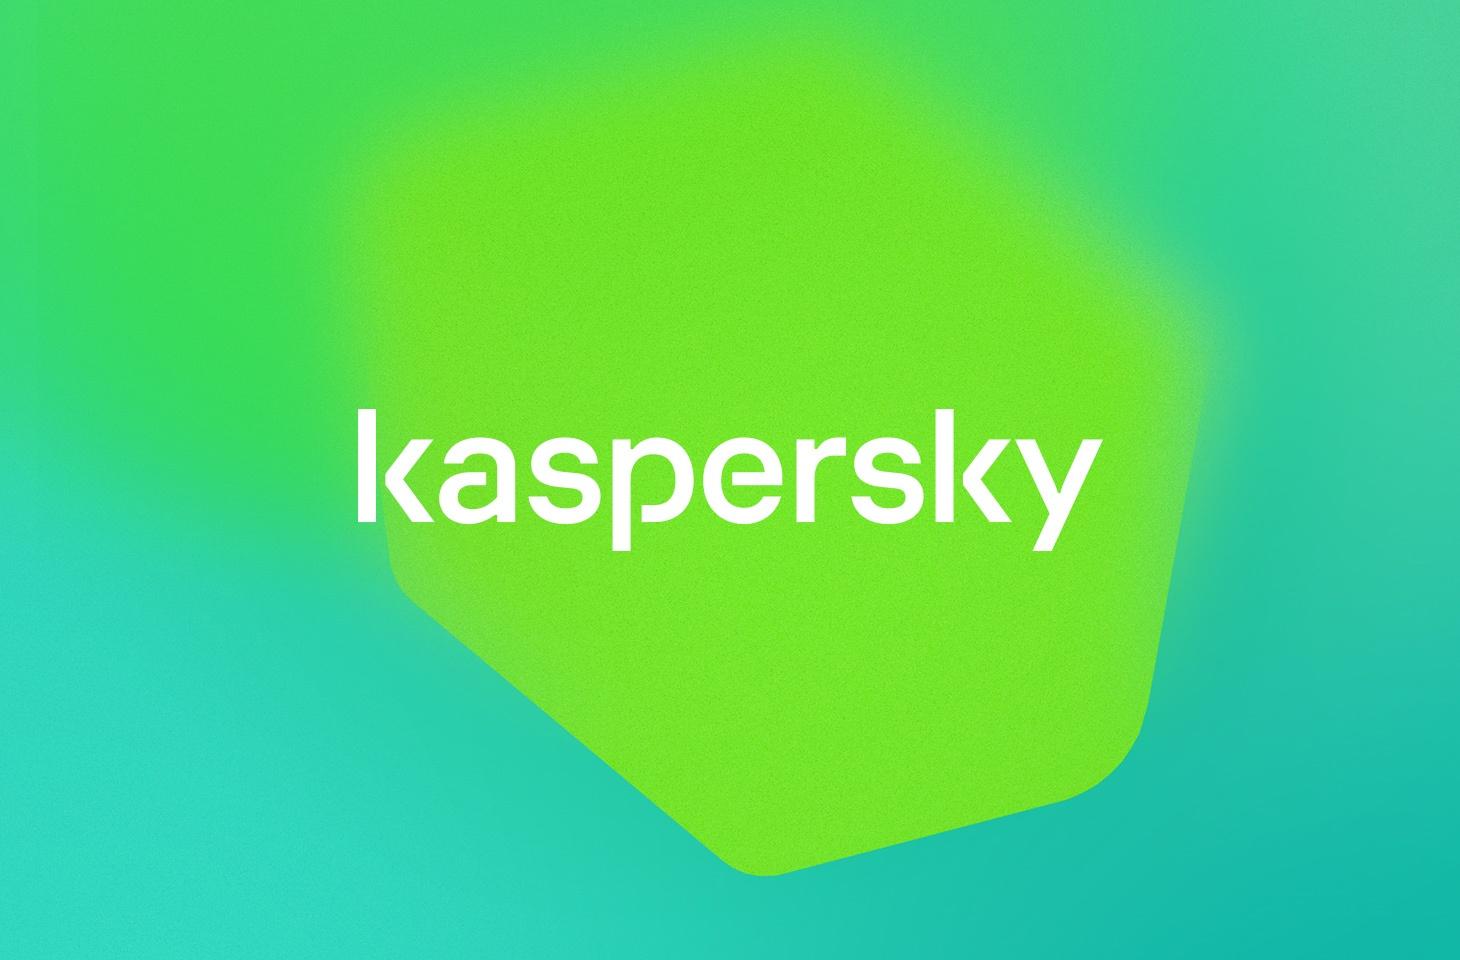 Kaspersky evid